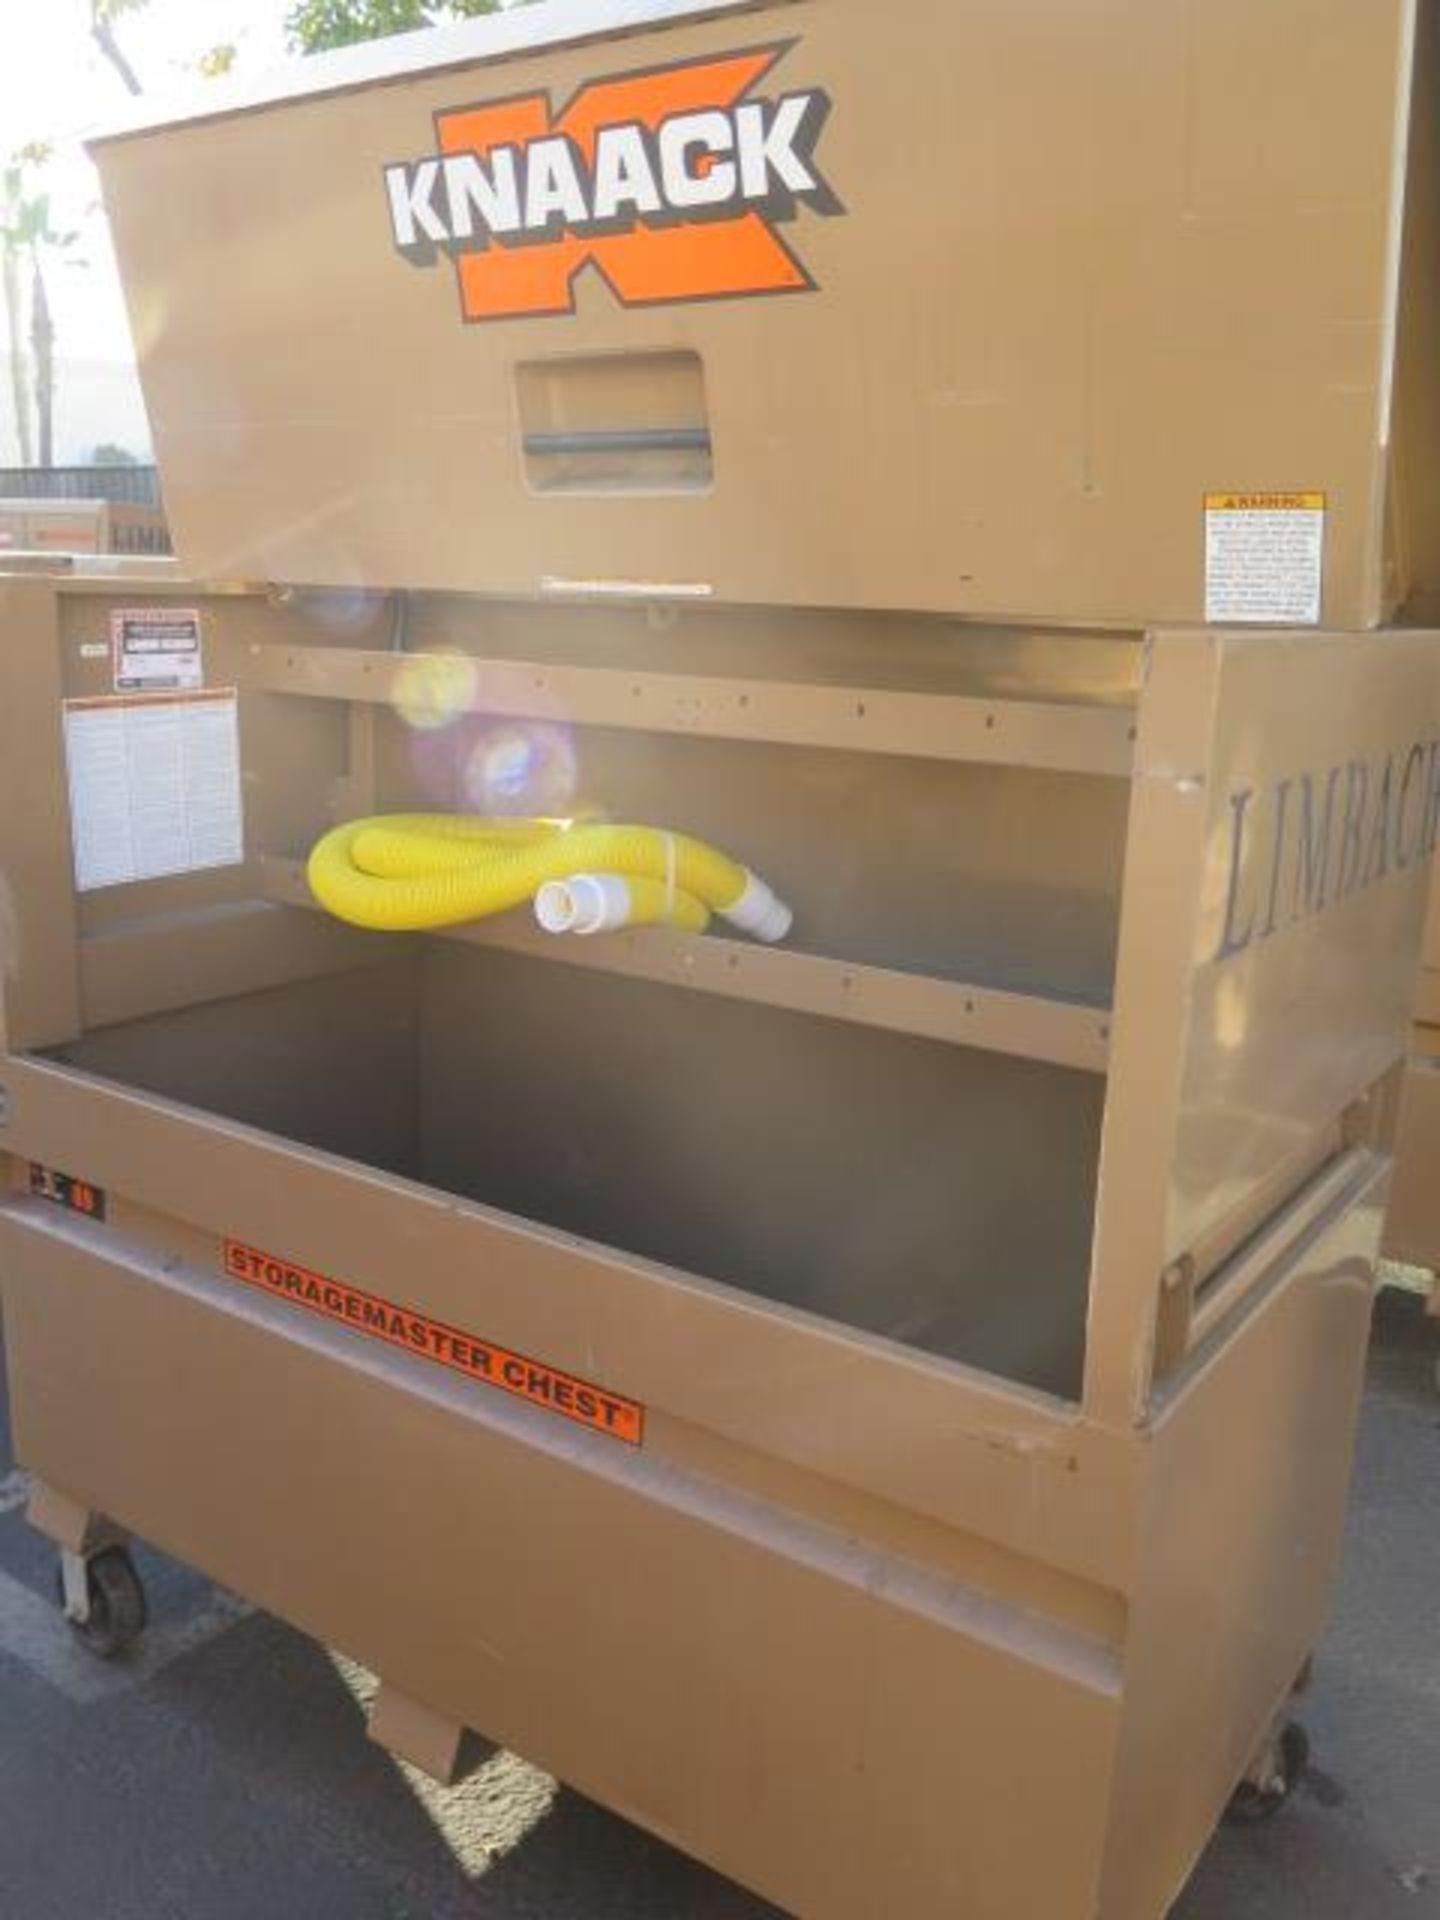 Knaack mdl. 89 Storagemaster Rolling Job Box (SOLD AS-IS - NO WARRANTY) - Image 5 of 9